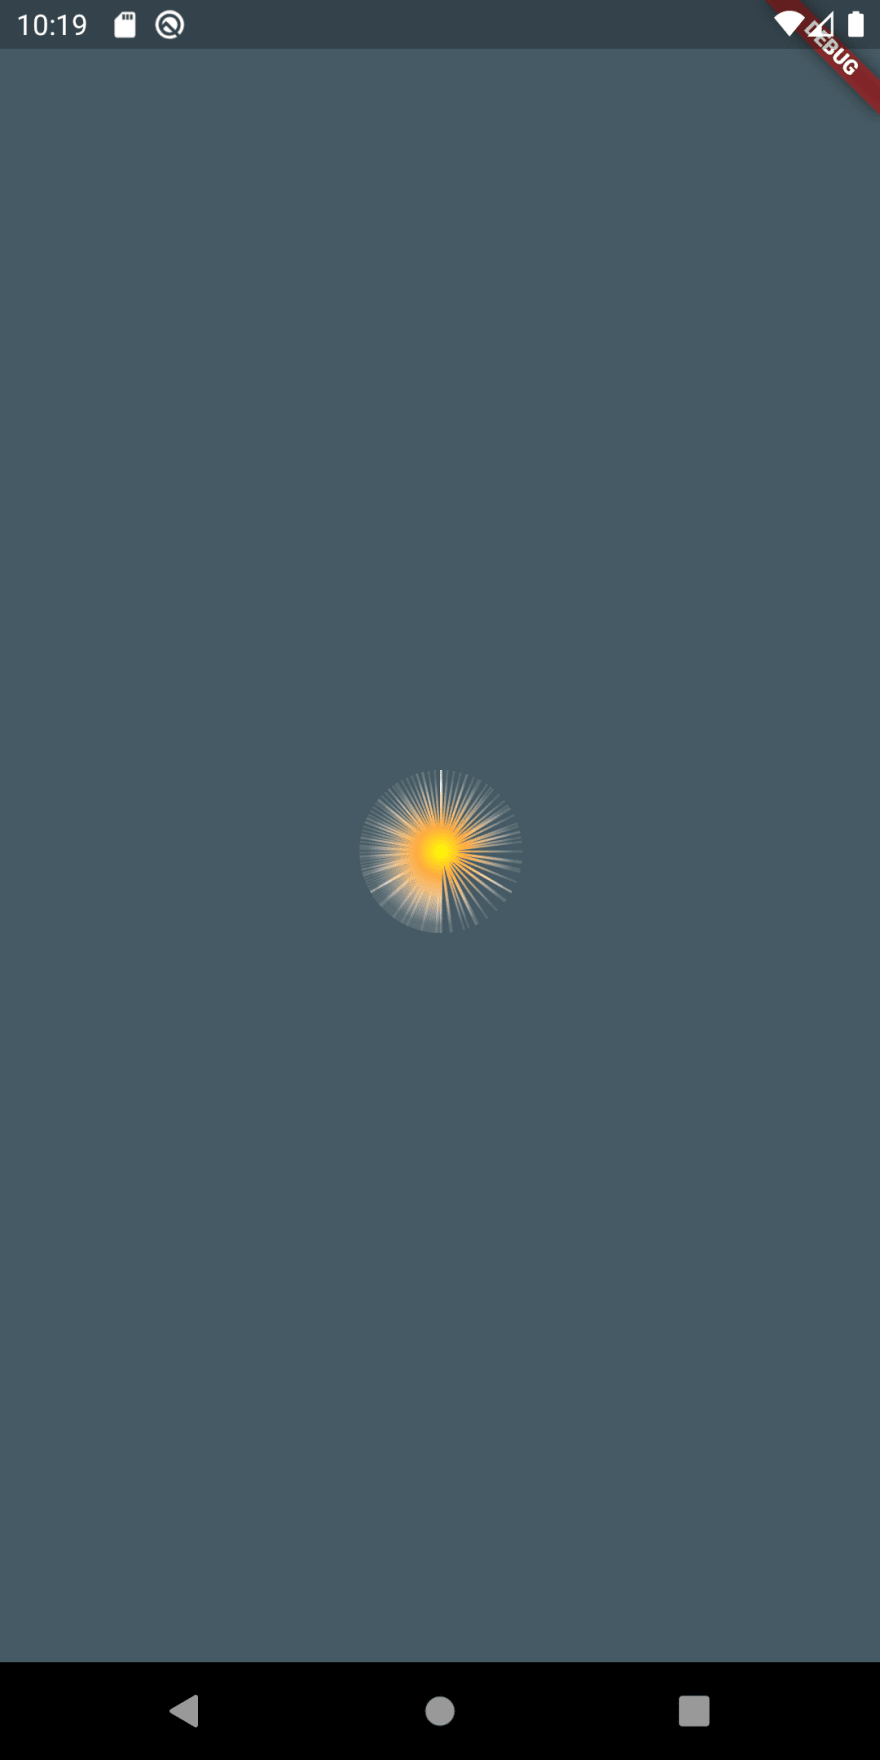 Flutter sparkler first iteration